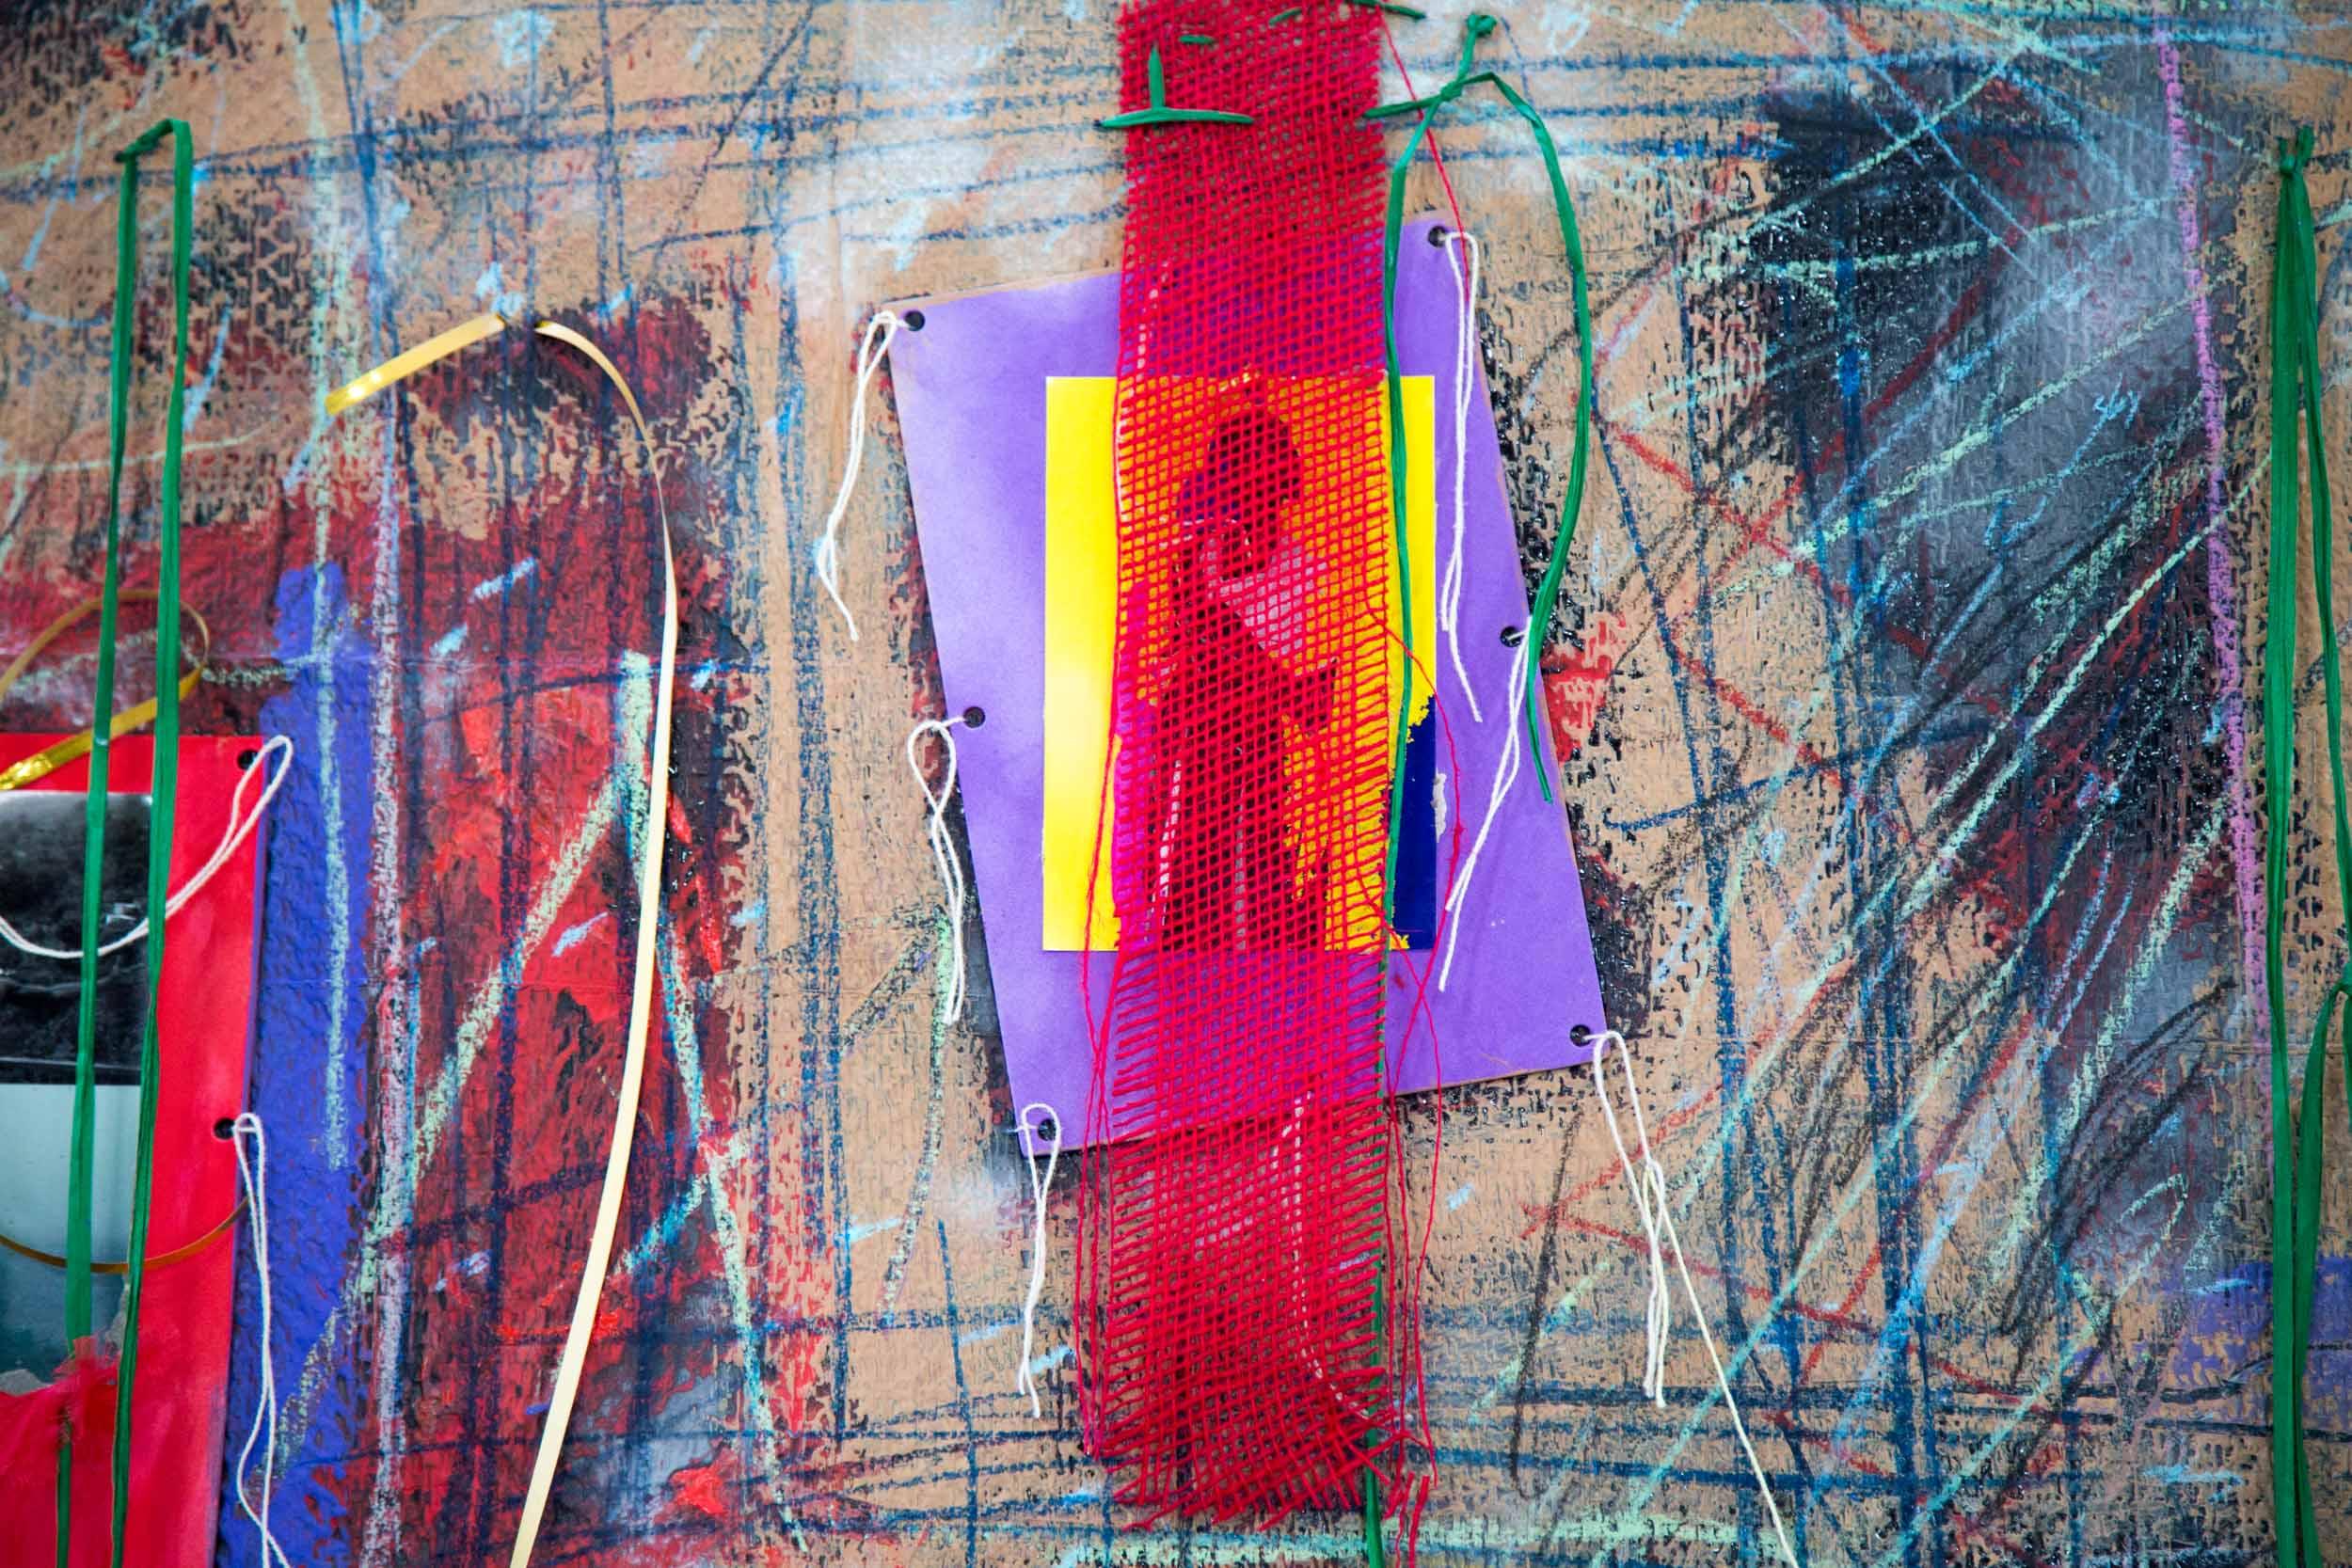 wassaic-project-artist-kwesi-abbensetts-2018-09-13-11-28-18.jpg